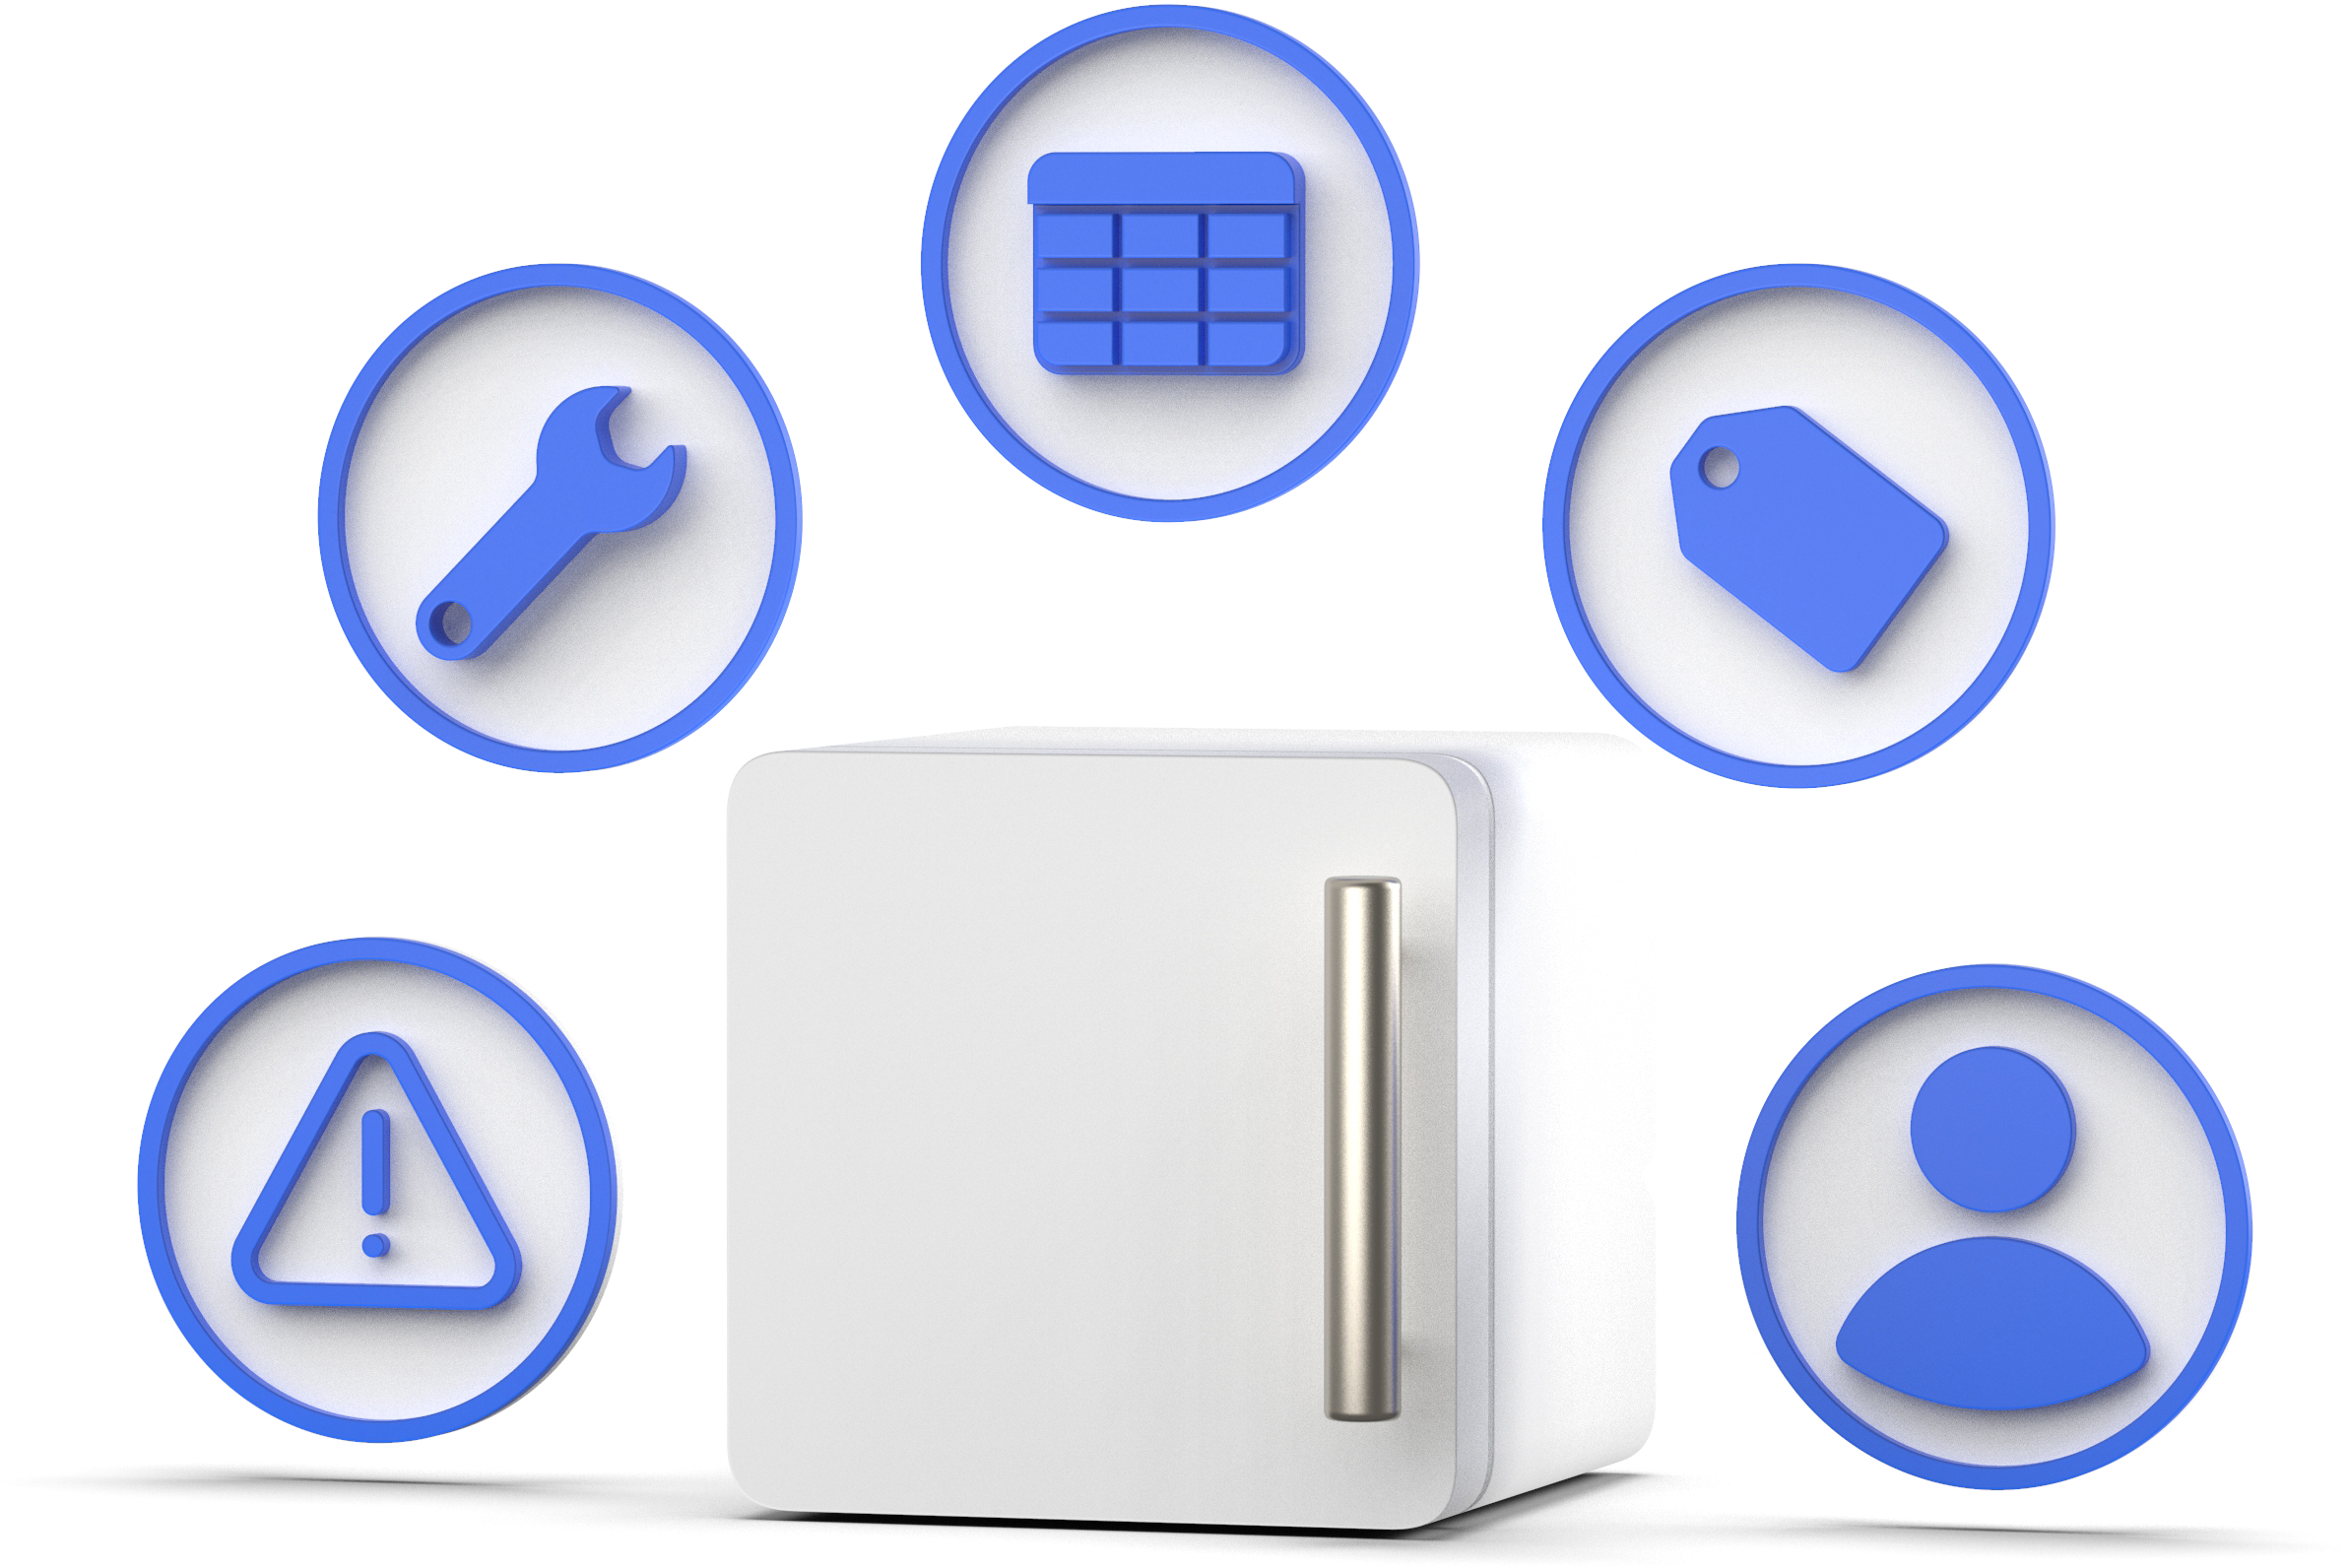 All assets around fridge + Science lab equipment